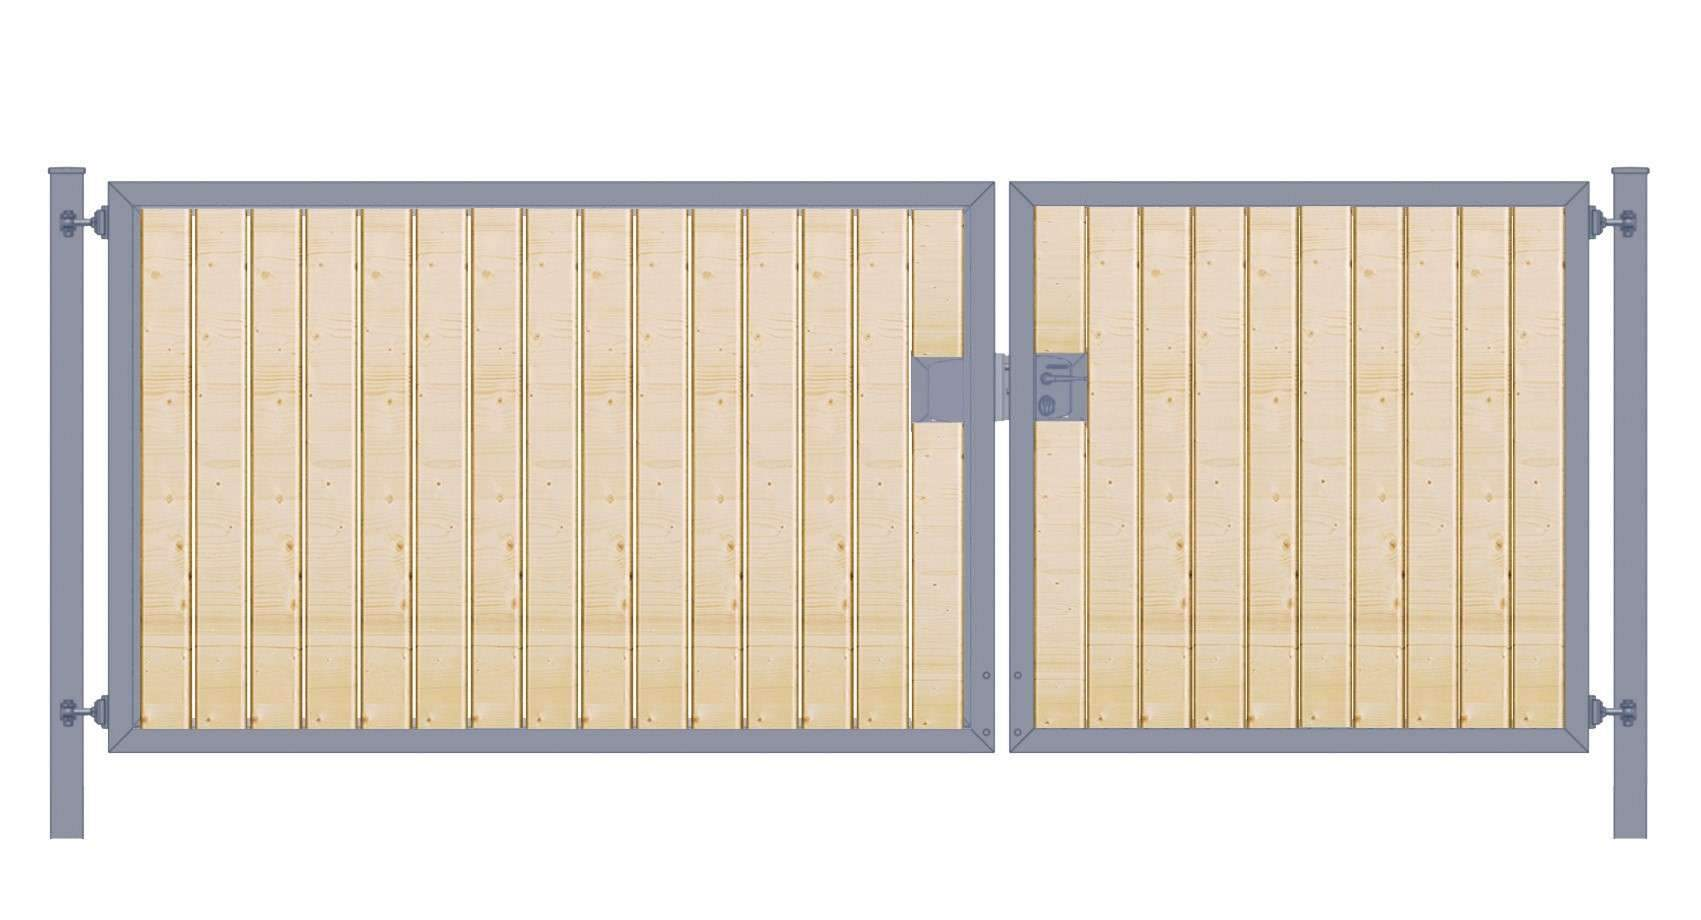 Einfahrtstor Holzfuellung senkrecht Premium zweifluegelig asymmetrisch anthrazit5cab13f9a6295 1280x1280 2x